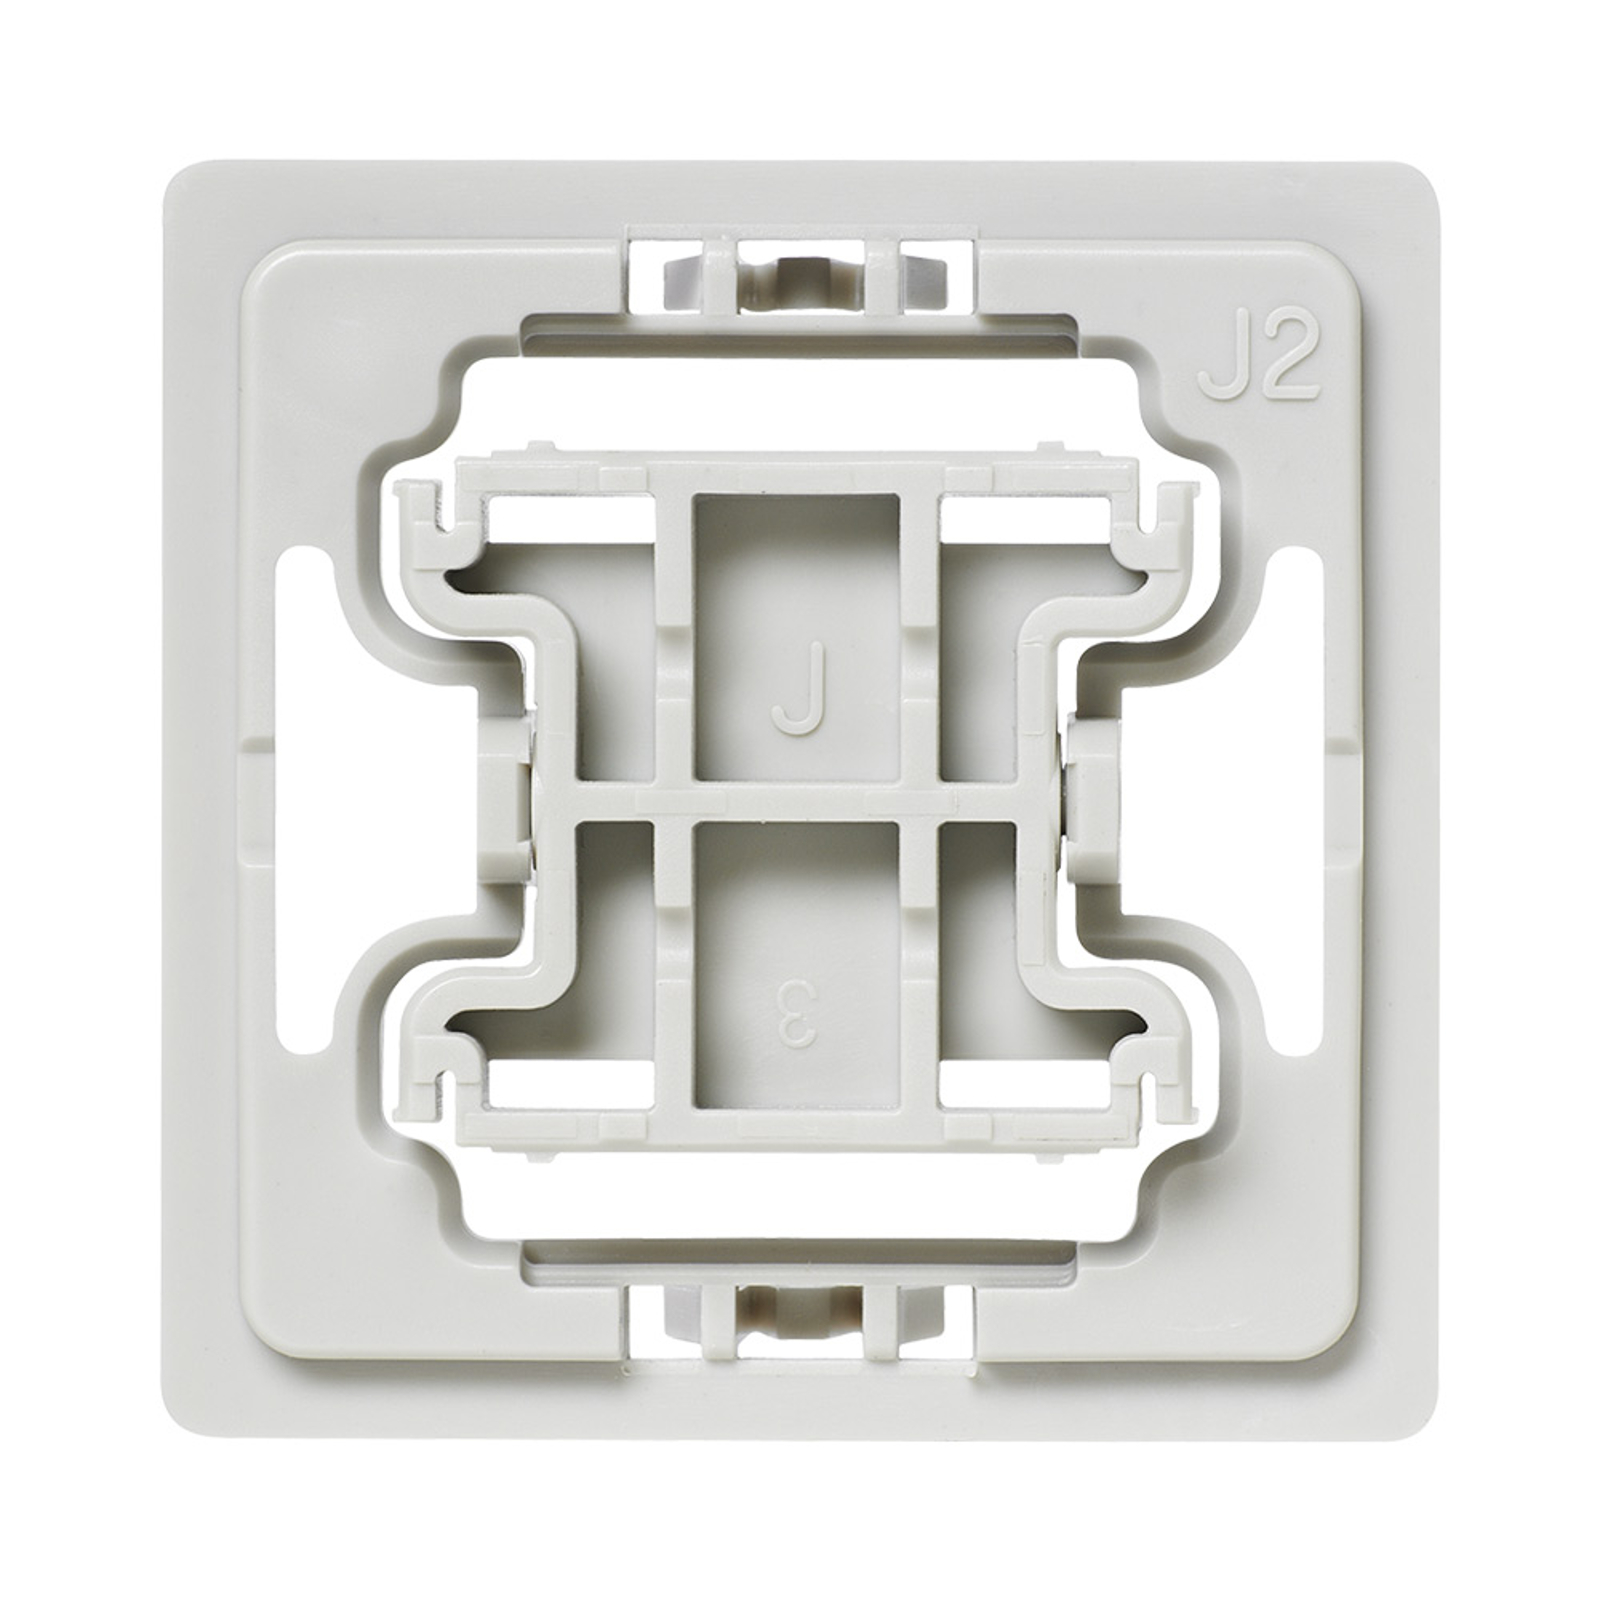 Homematic IP adapter przełącznika Jung J2 1x